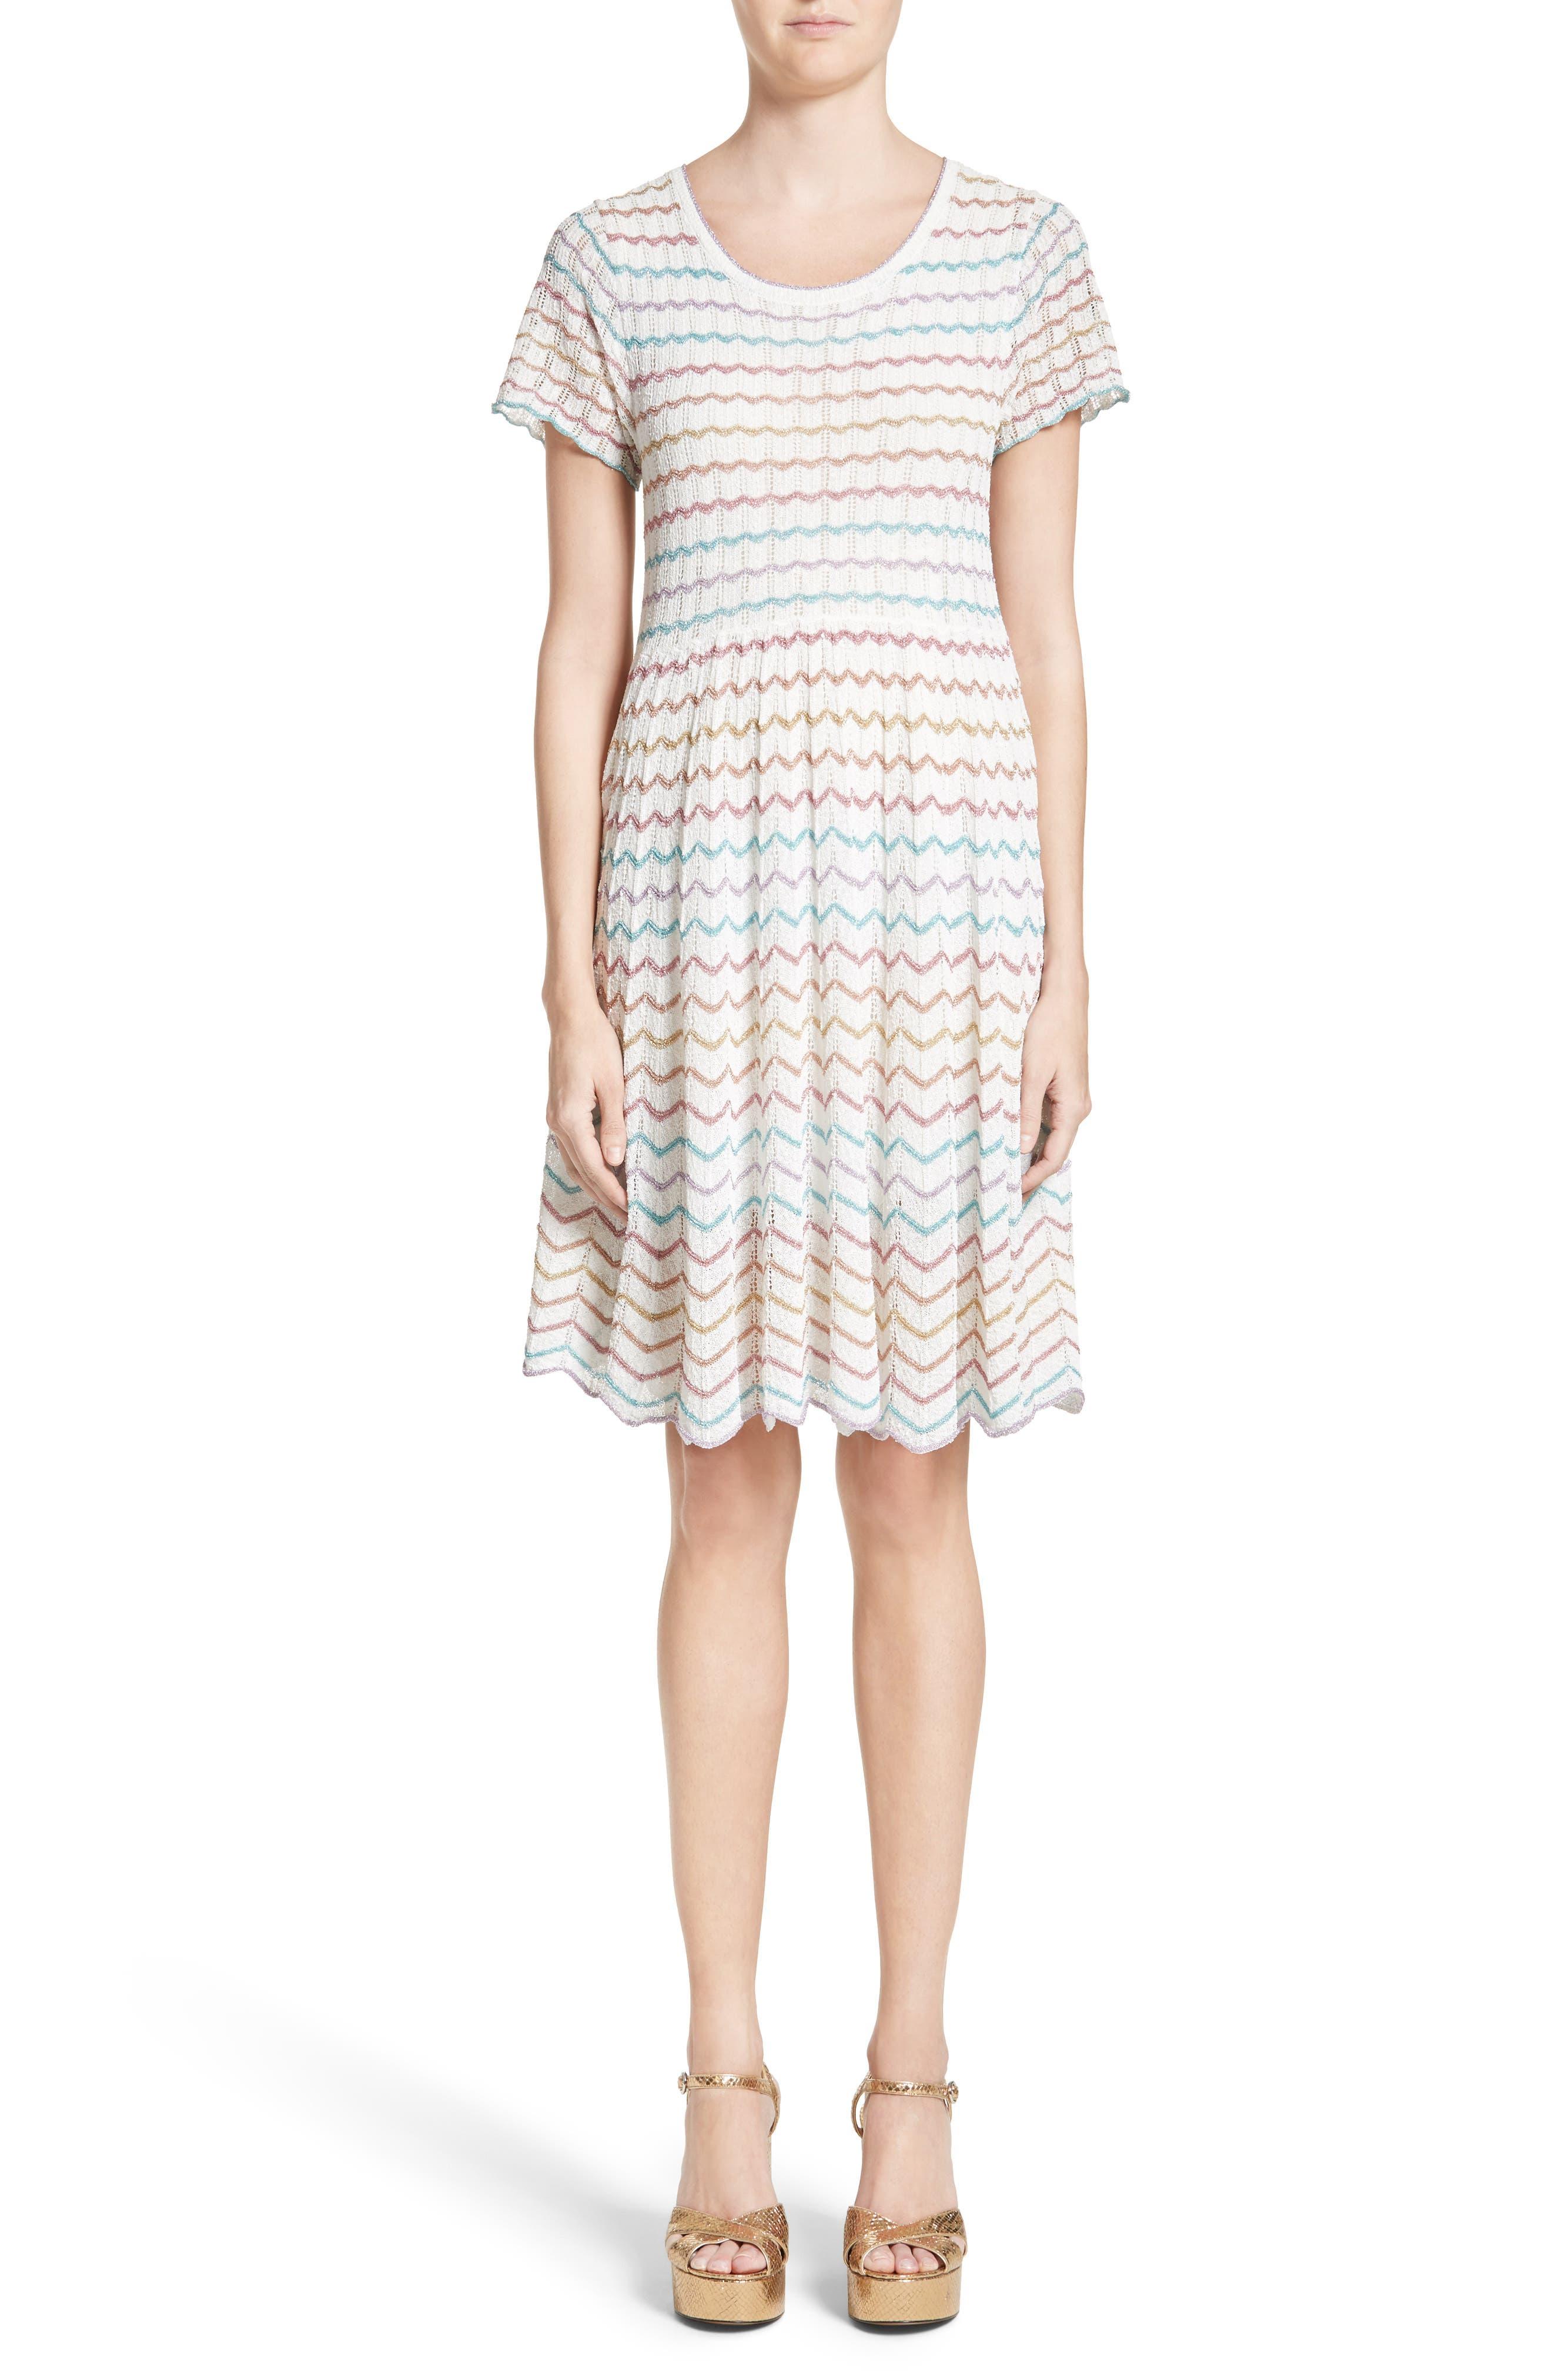 Alternate Image 1 Selected - MARC JACOBS Knit Babydoll Dress